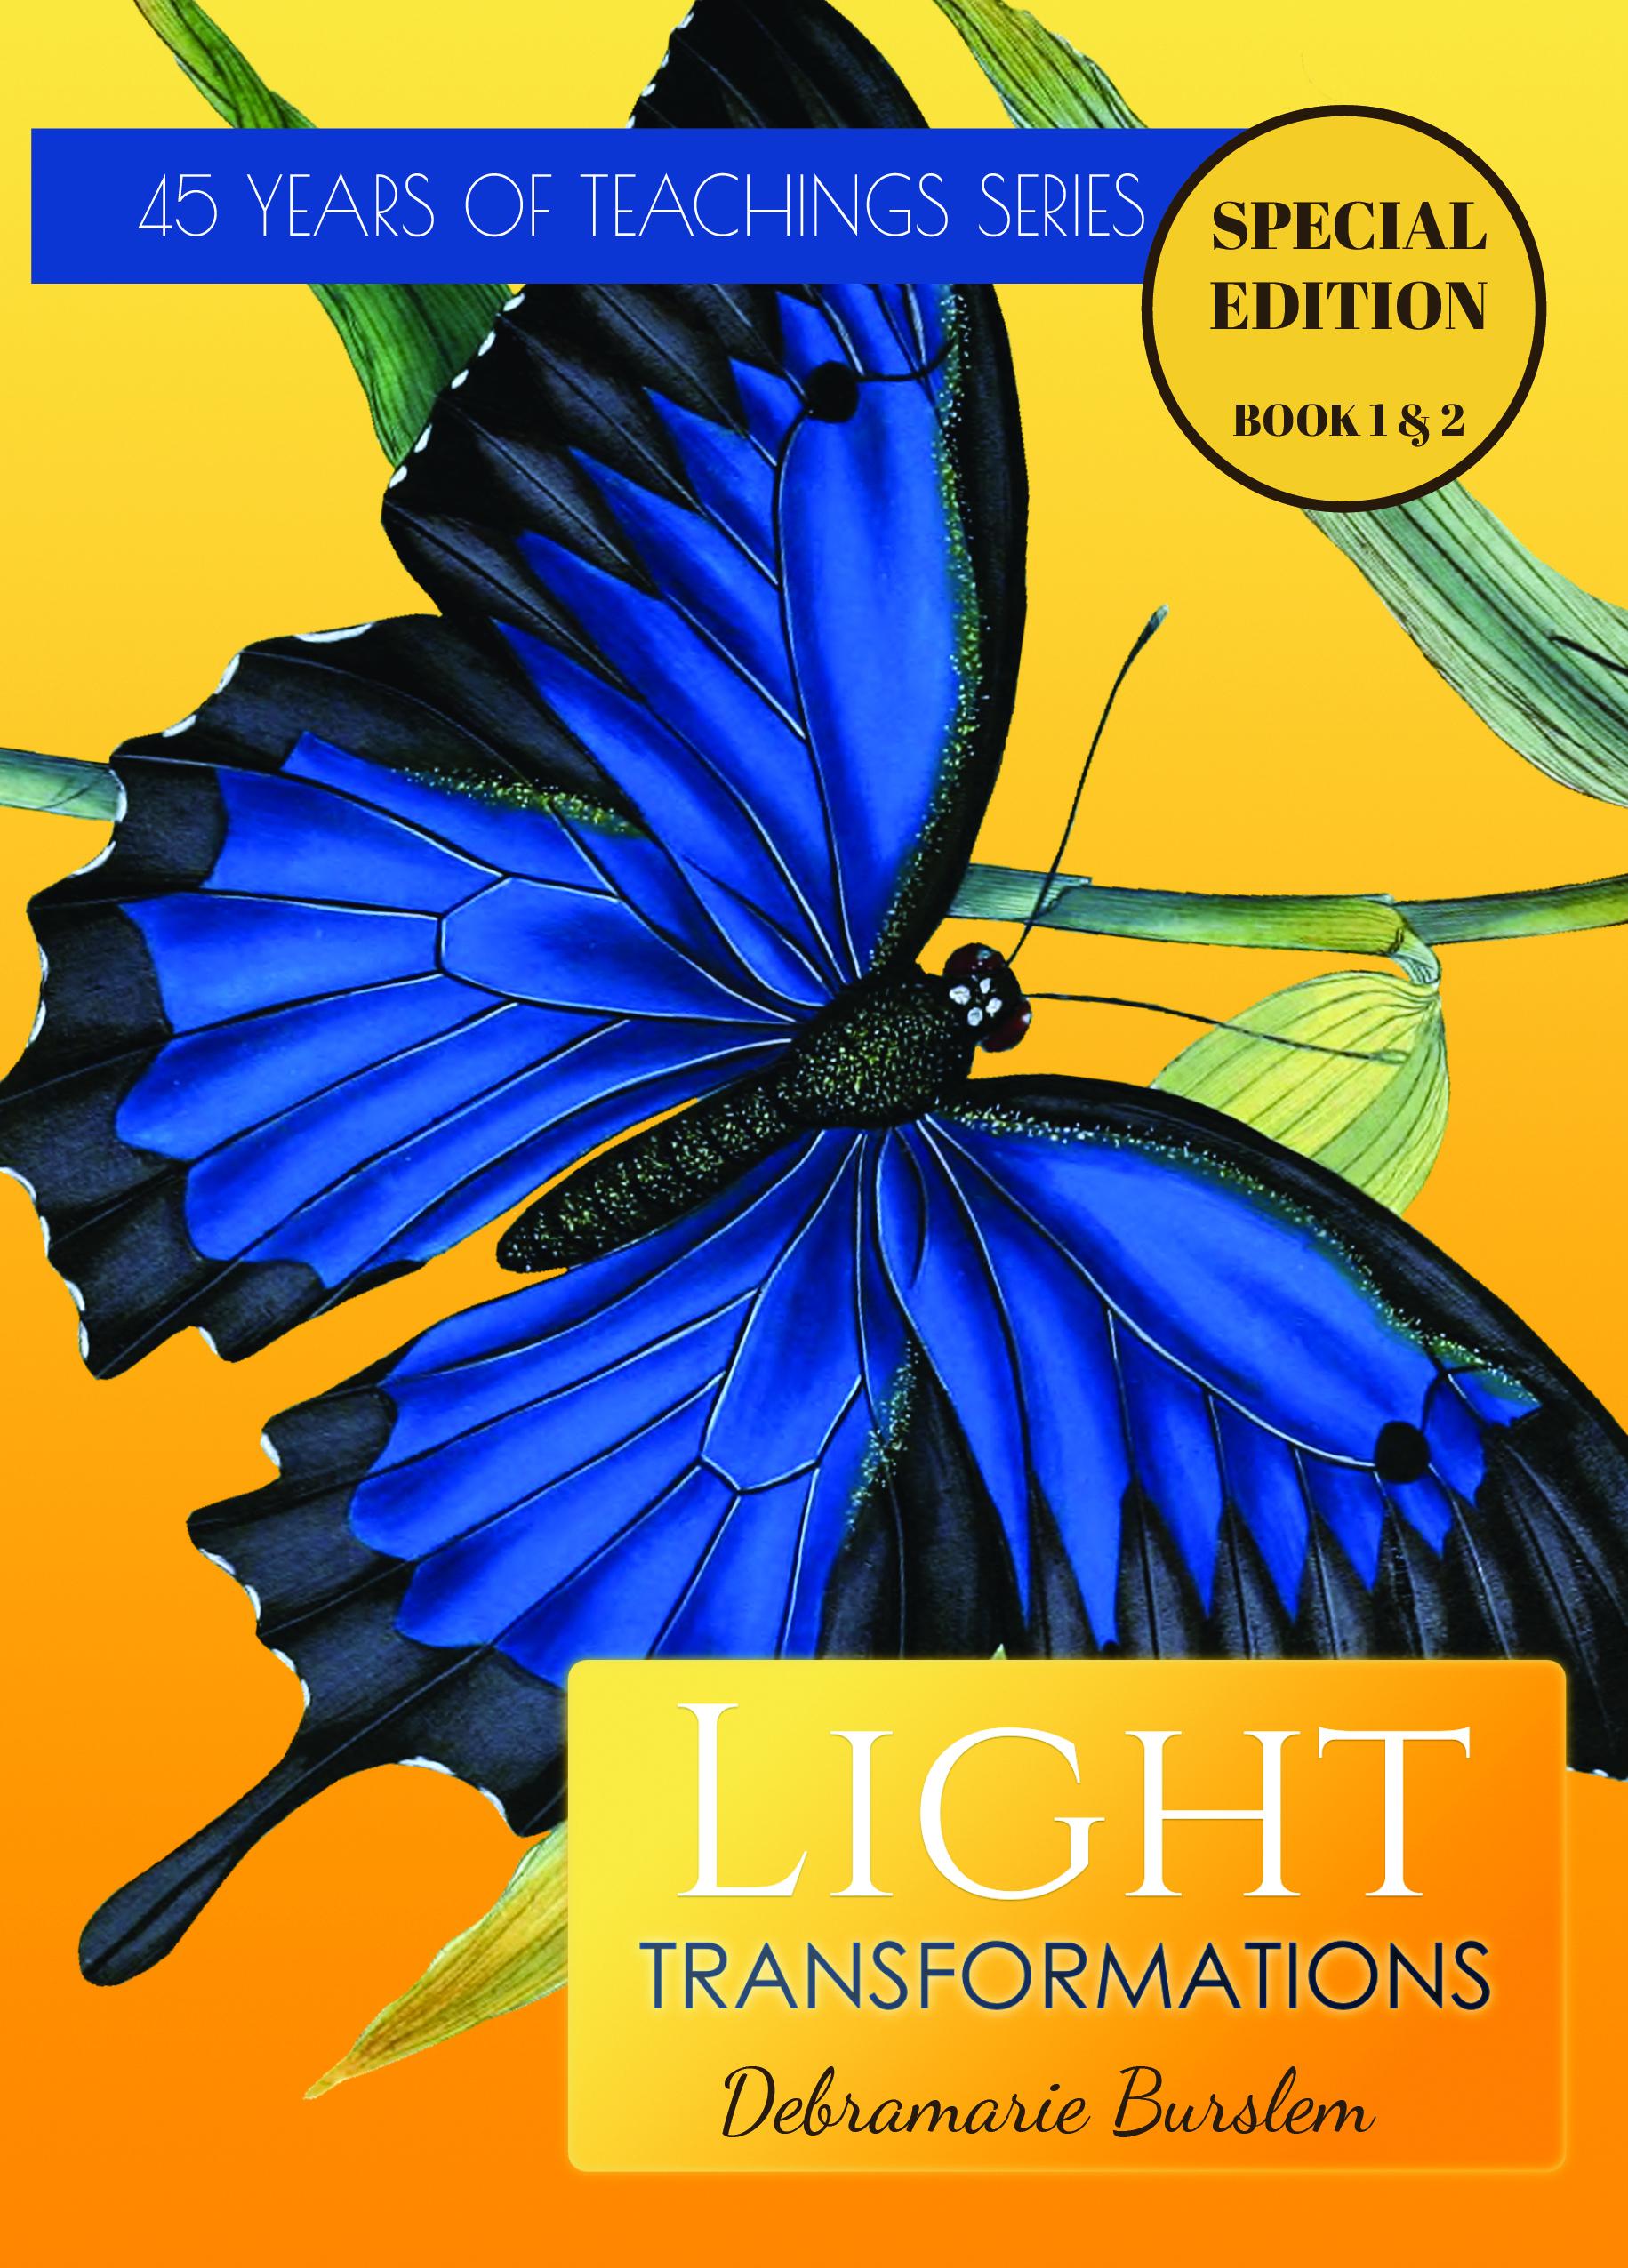 Light Transformations - 45 Years of Teachings (Paperback) PB-LT